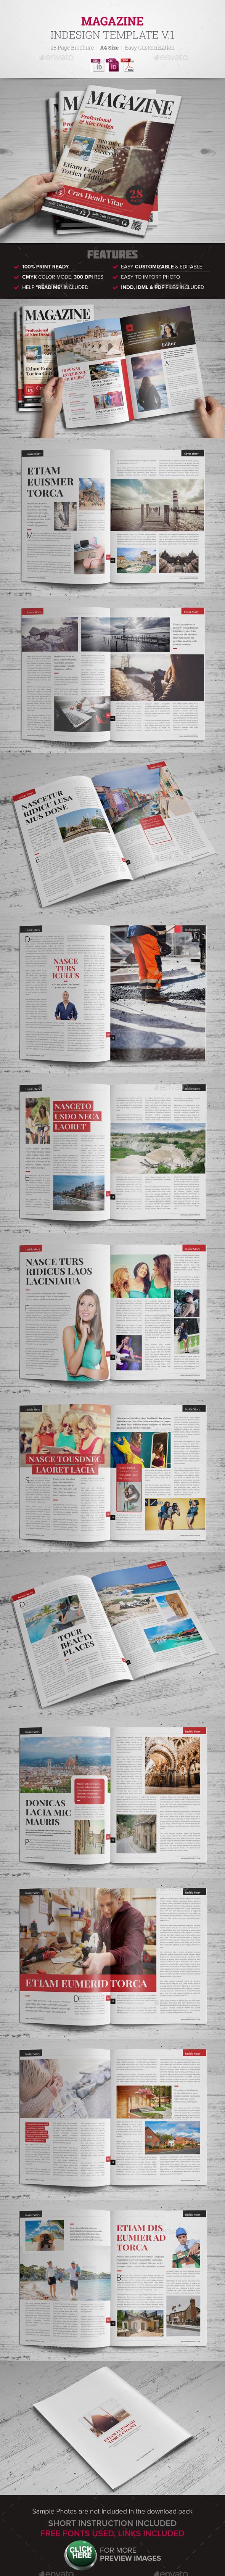 Magazine InDesign Template v1  - Magazines Print Templates